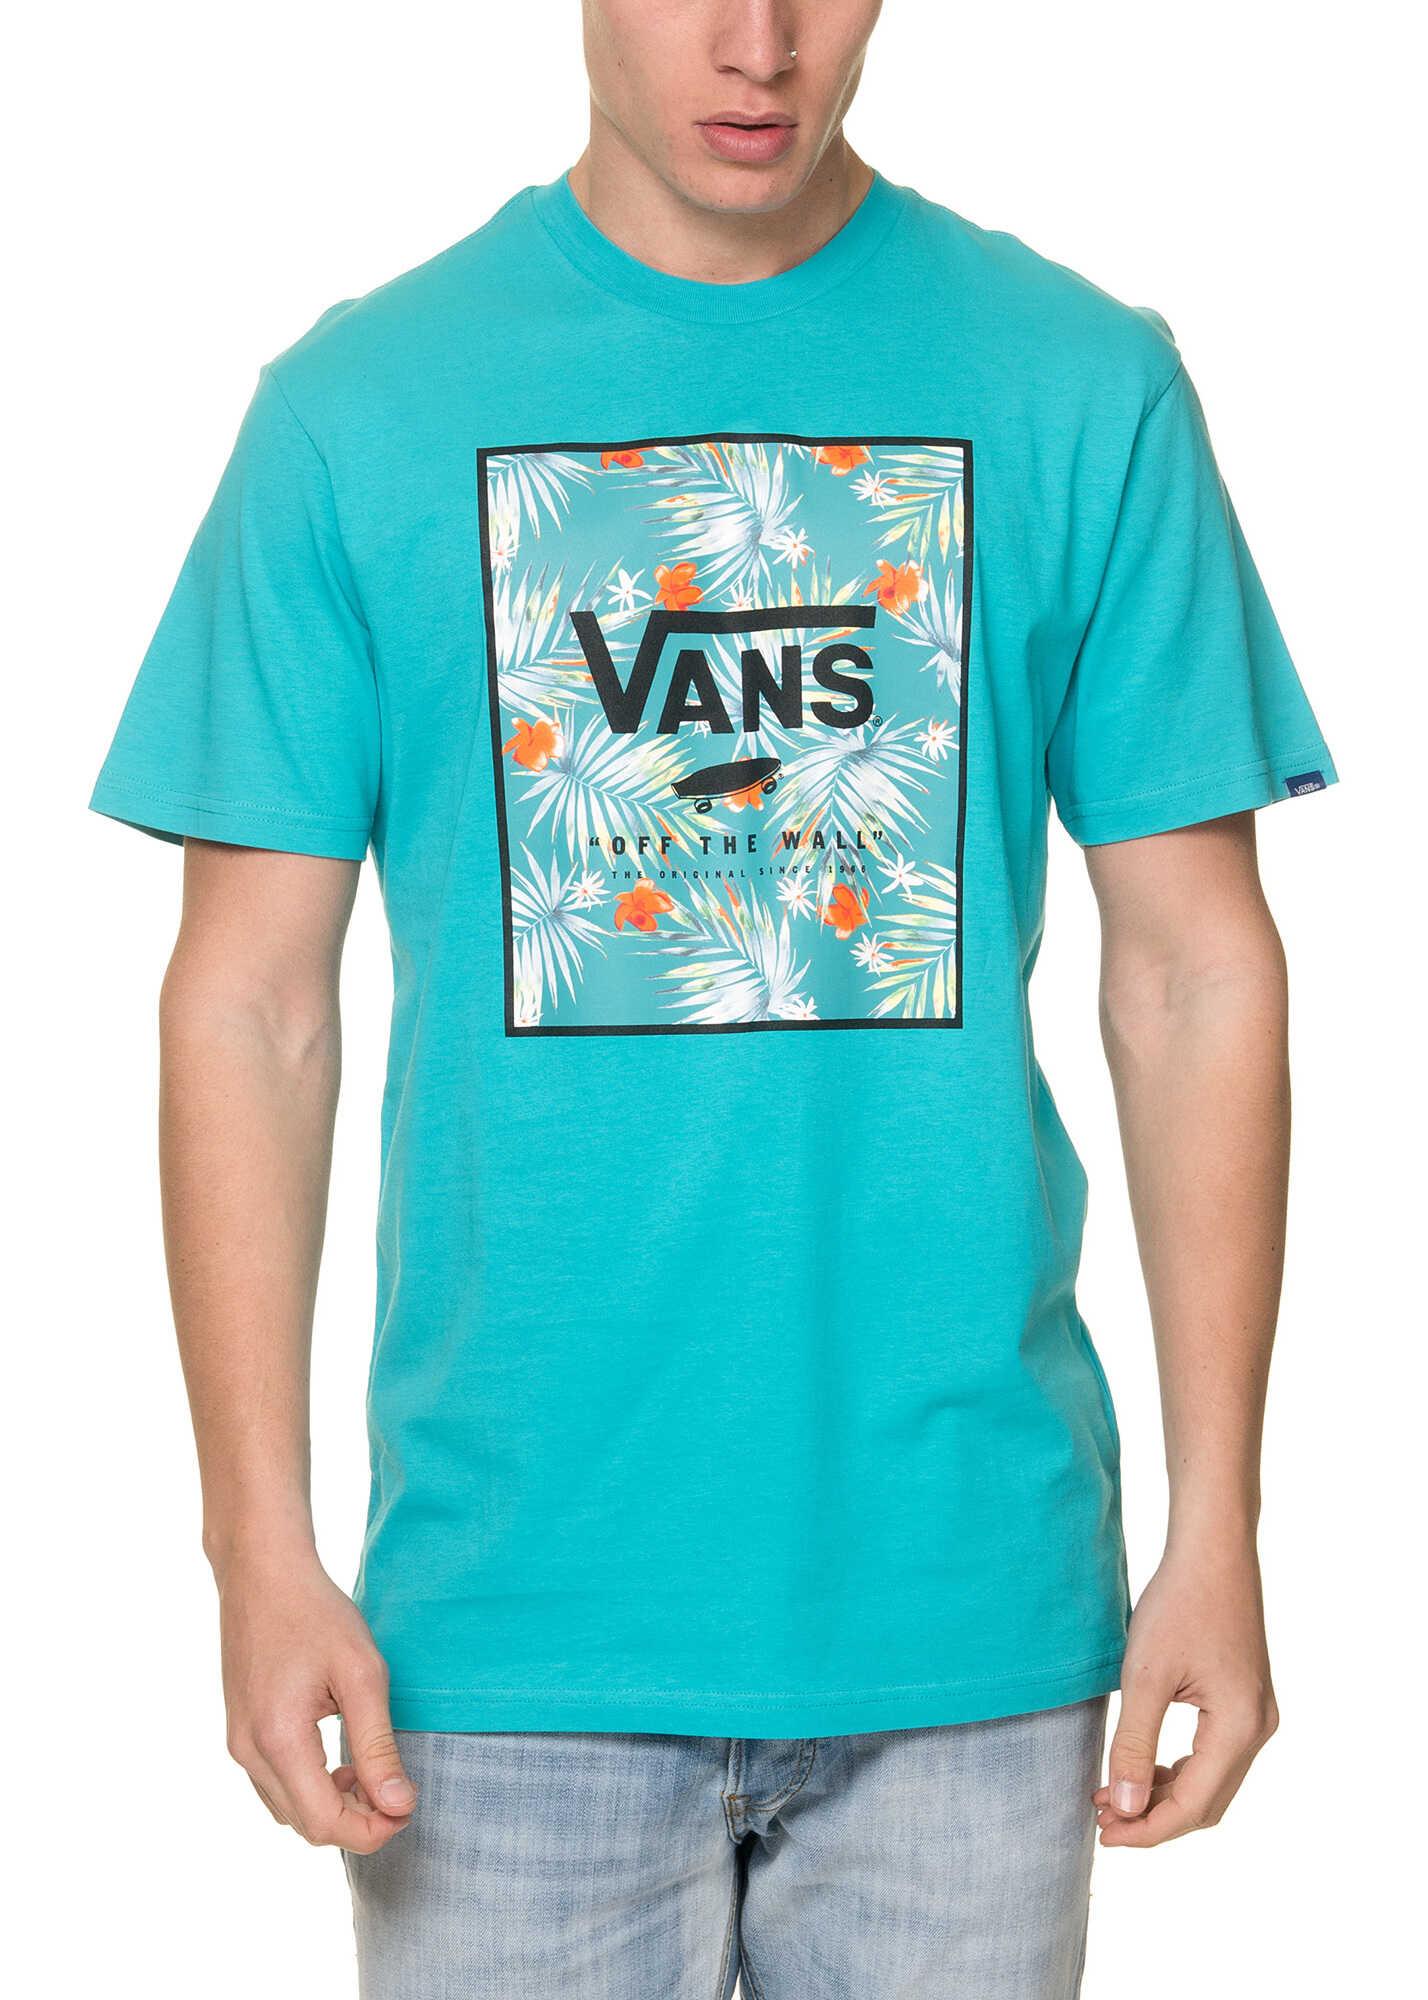 Tricouri vans print box mens turquoise t shirt teal baltic for T shirt printing fairlane mall